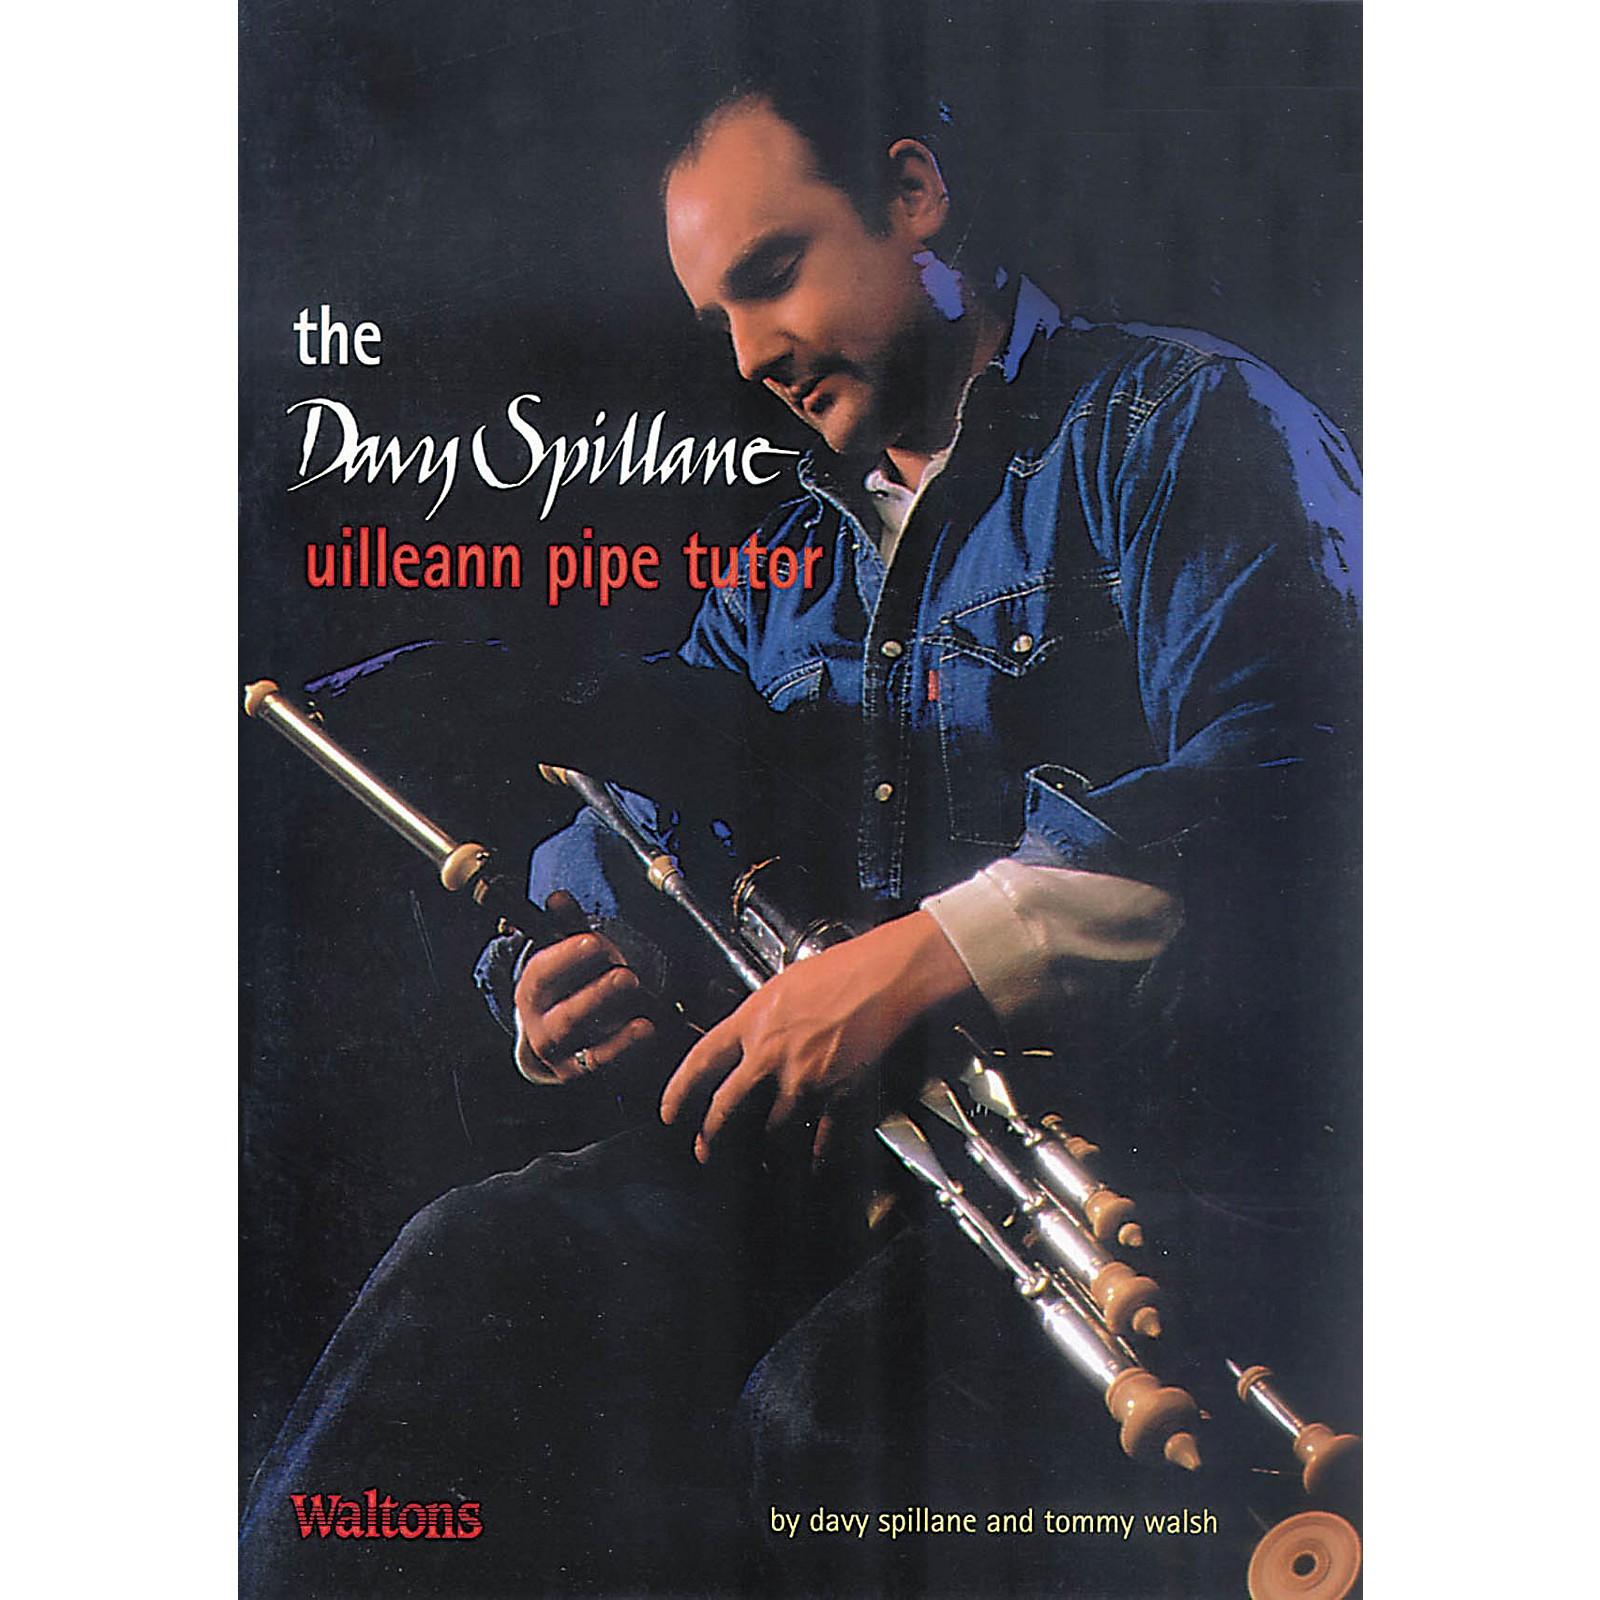 Waltons The Davy Spillane Uilleann Pipe Tutor Waltons Irish Music Books Series Softcover Written by Davy Spillane